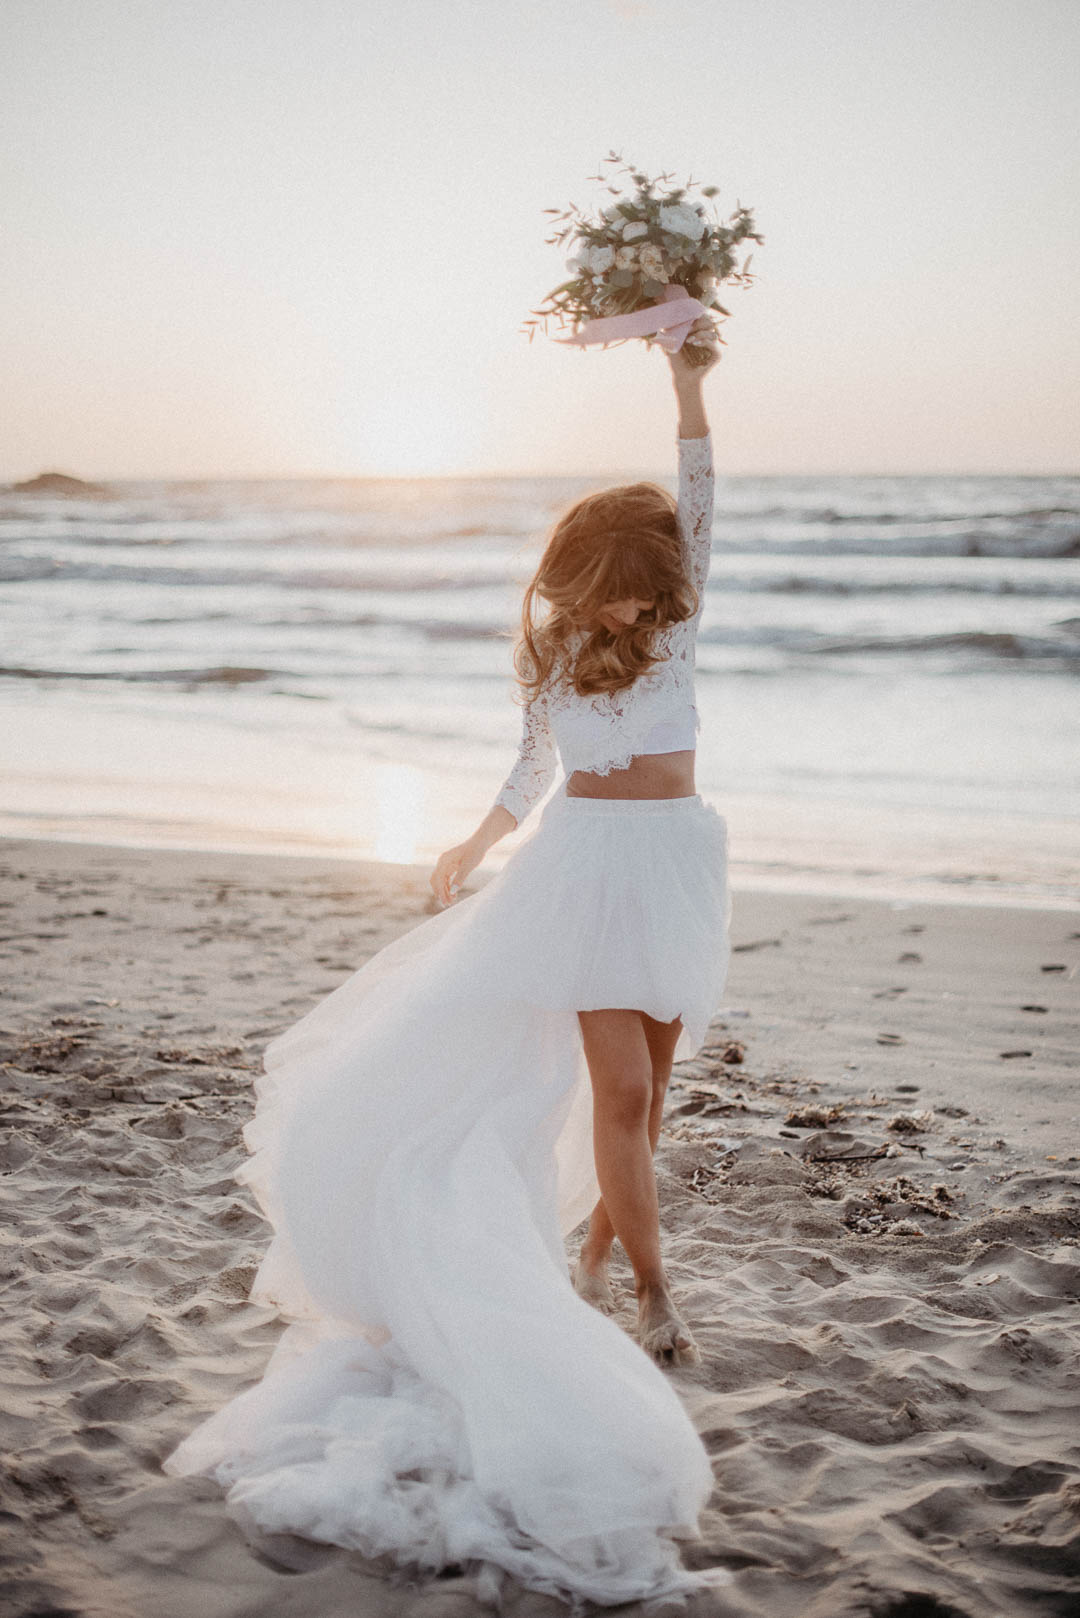 wedding-photographer-destination-fineart-bespoke-reportage-napoli-nabilah-vivianeizzo-spazio46-130